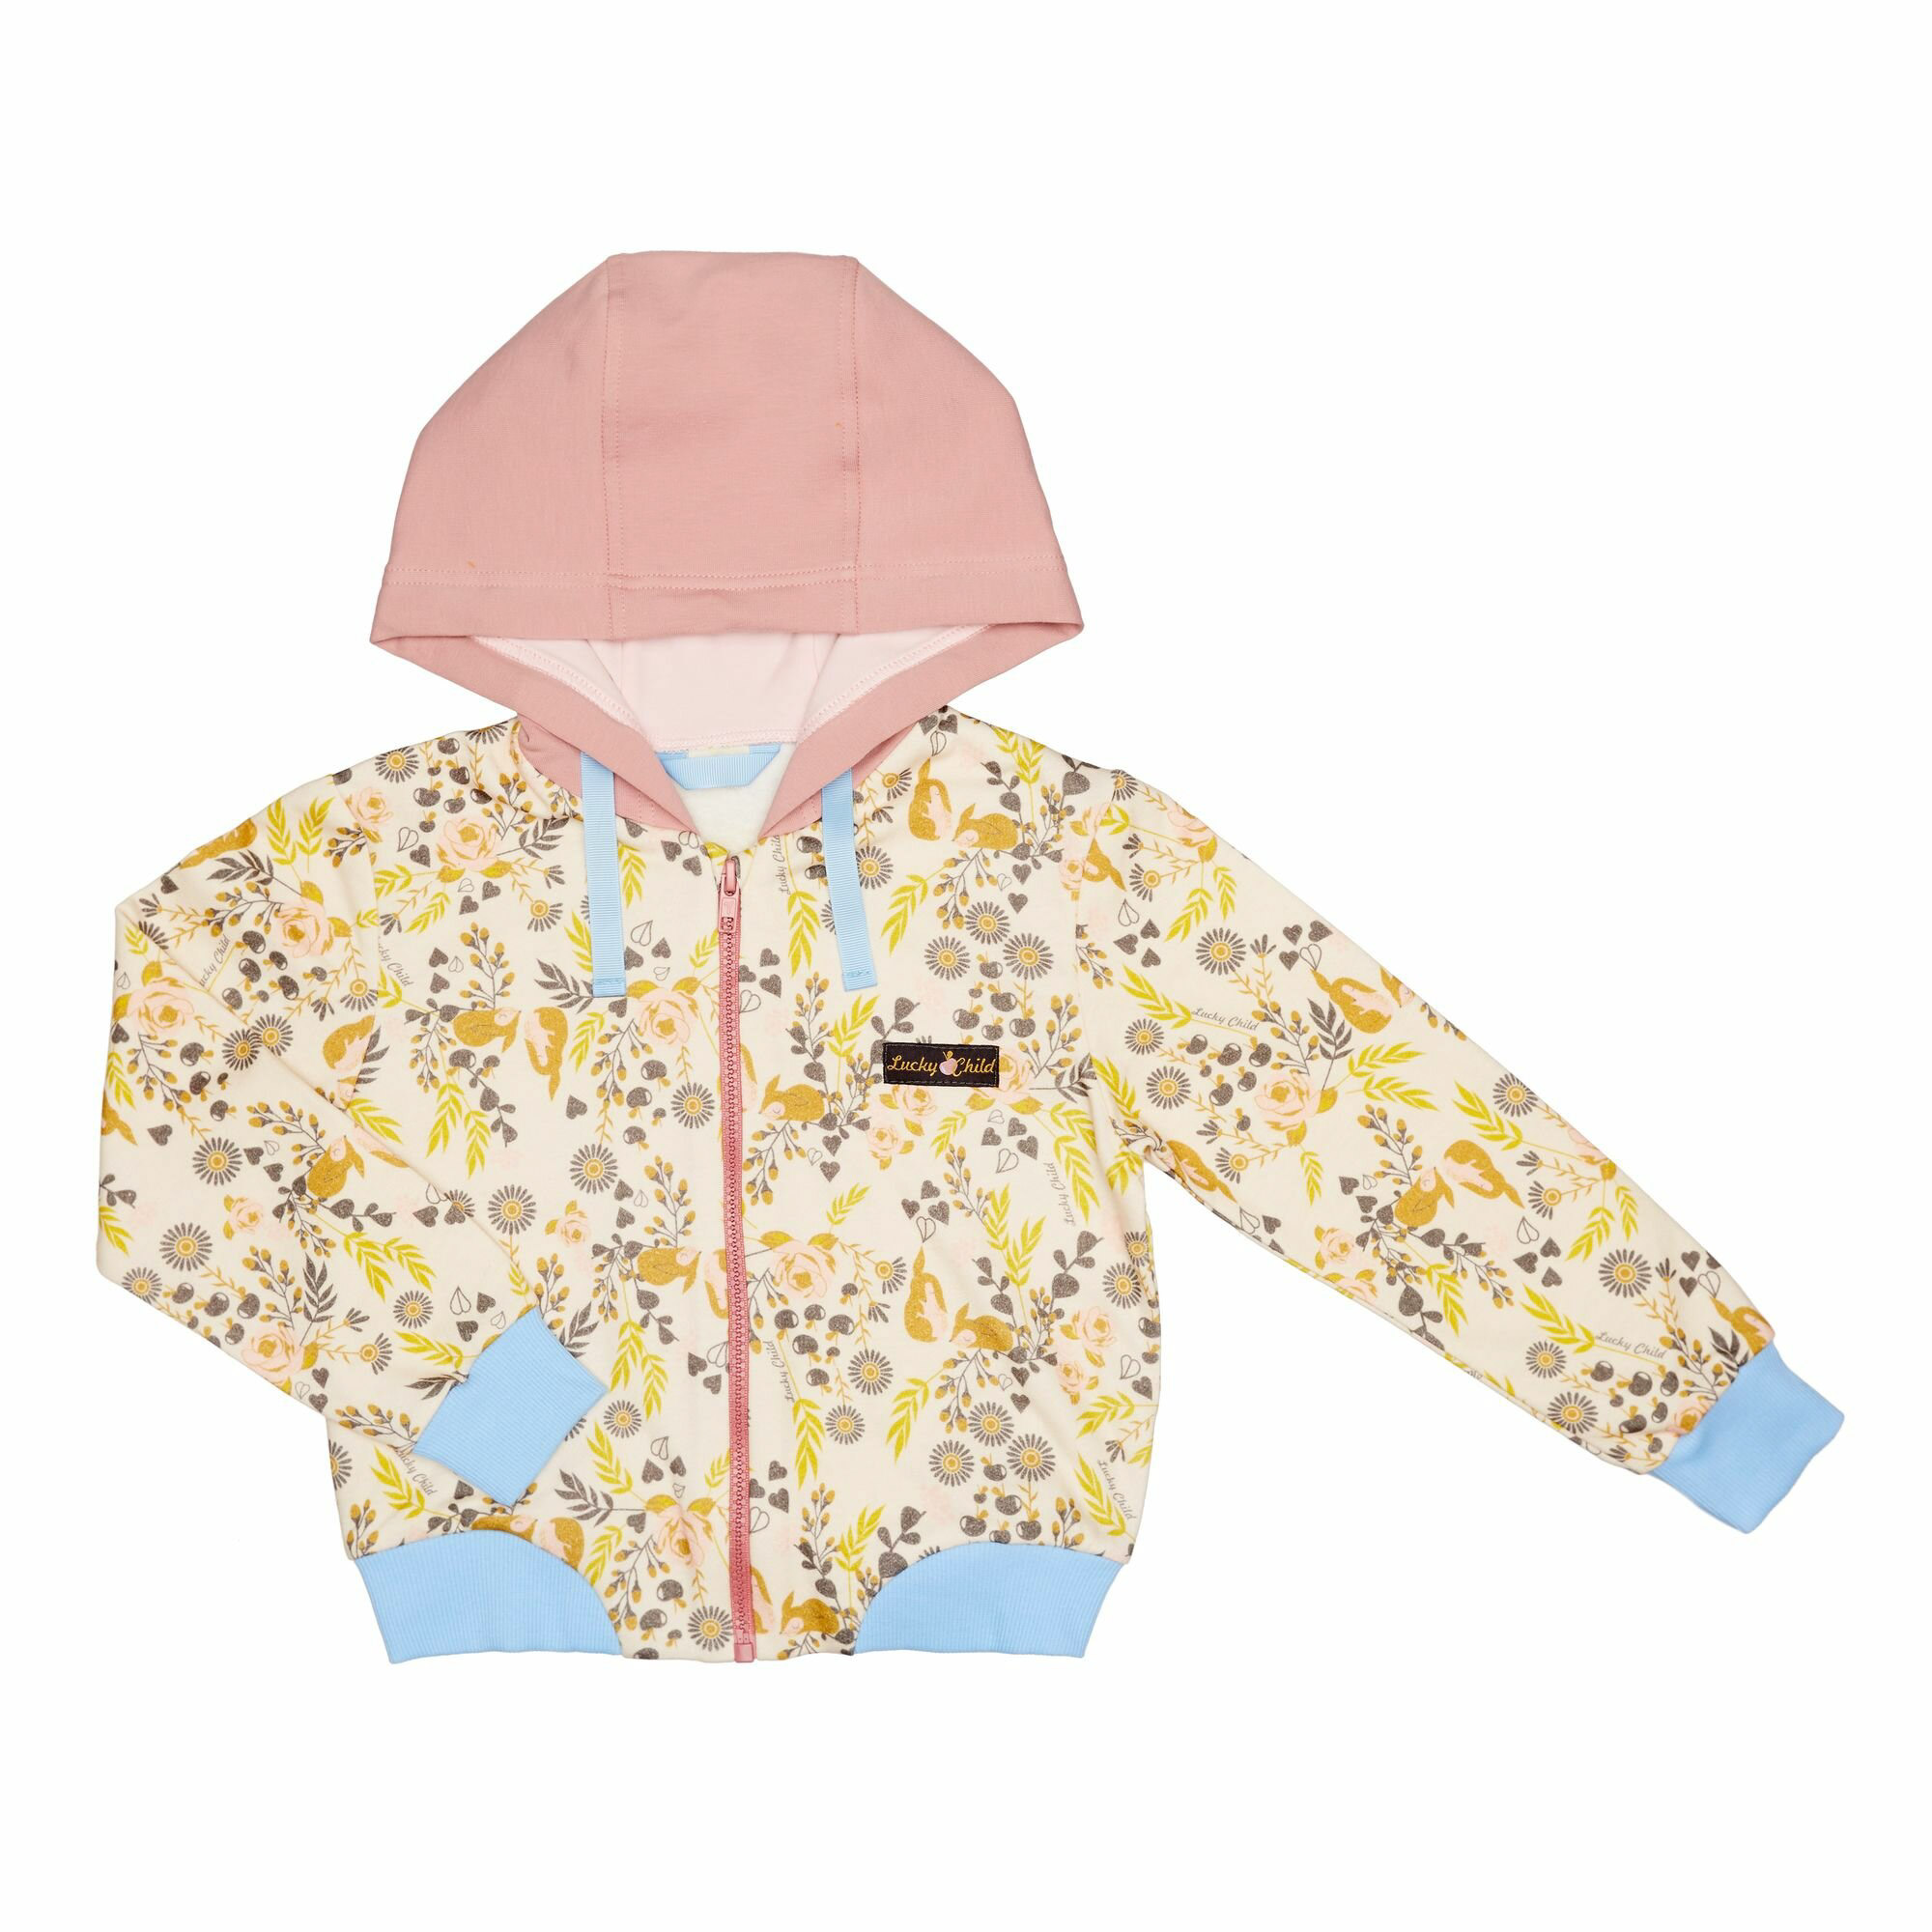 Куртка Lucky Child  Осенний лес цветная 128-134